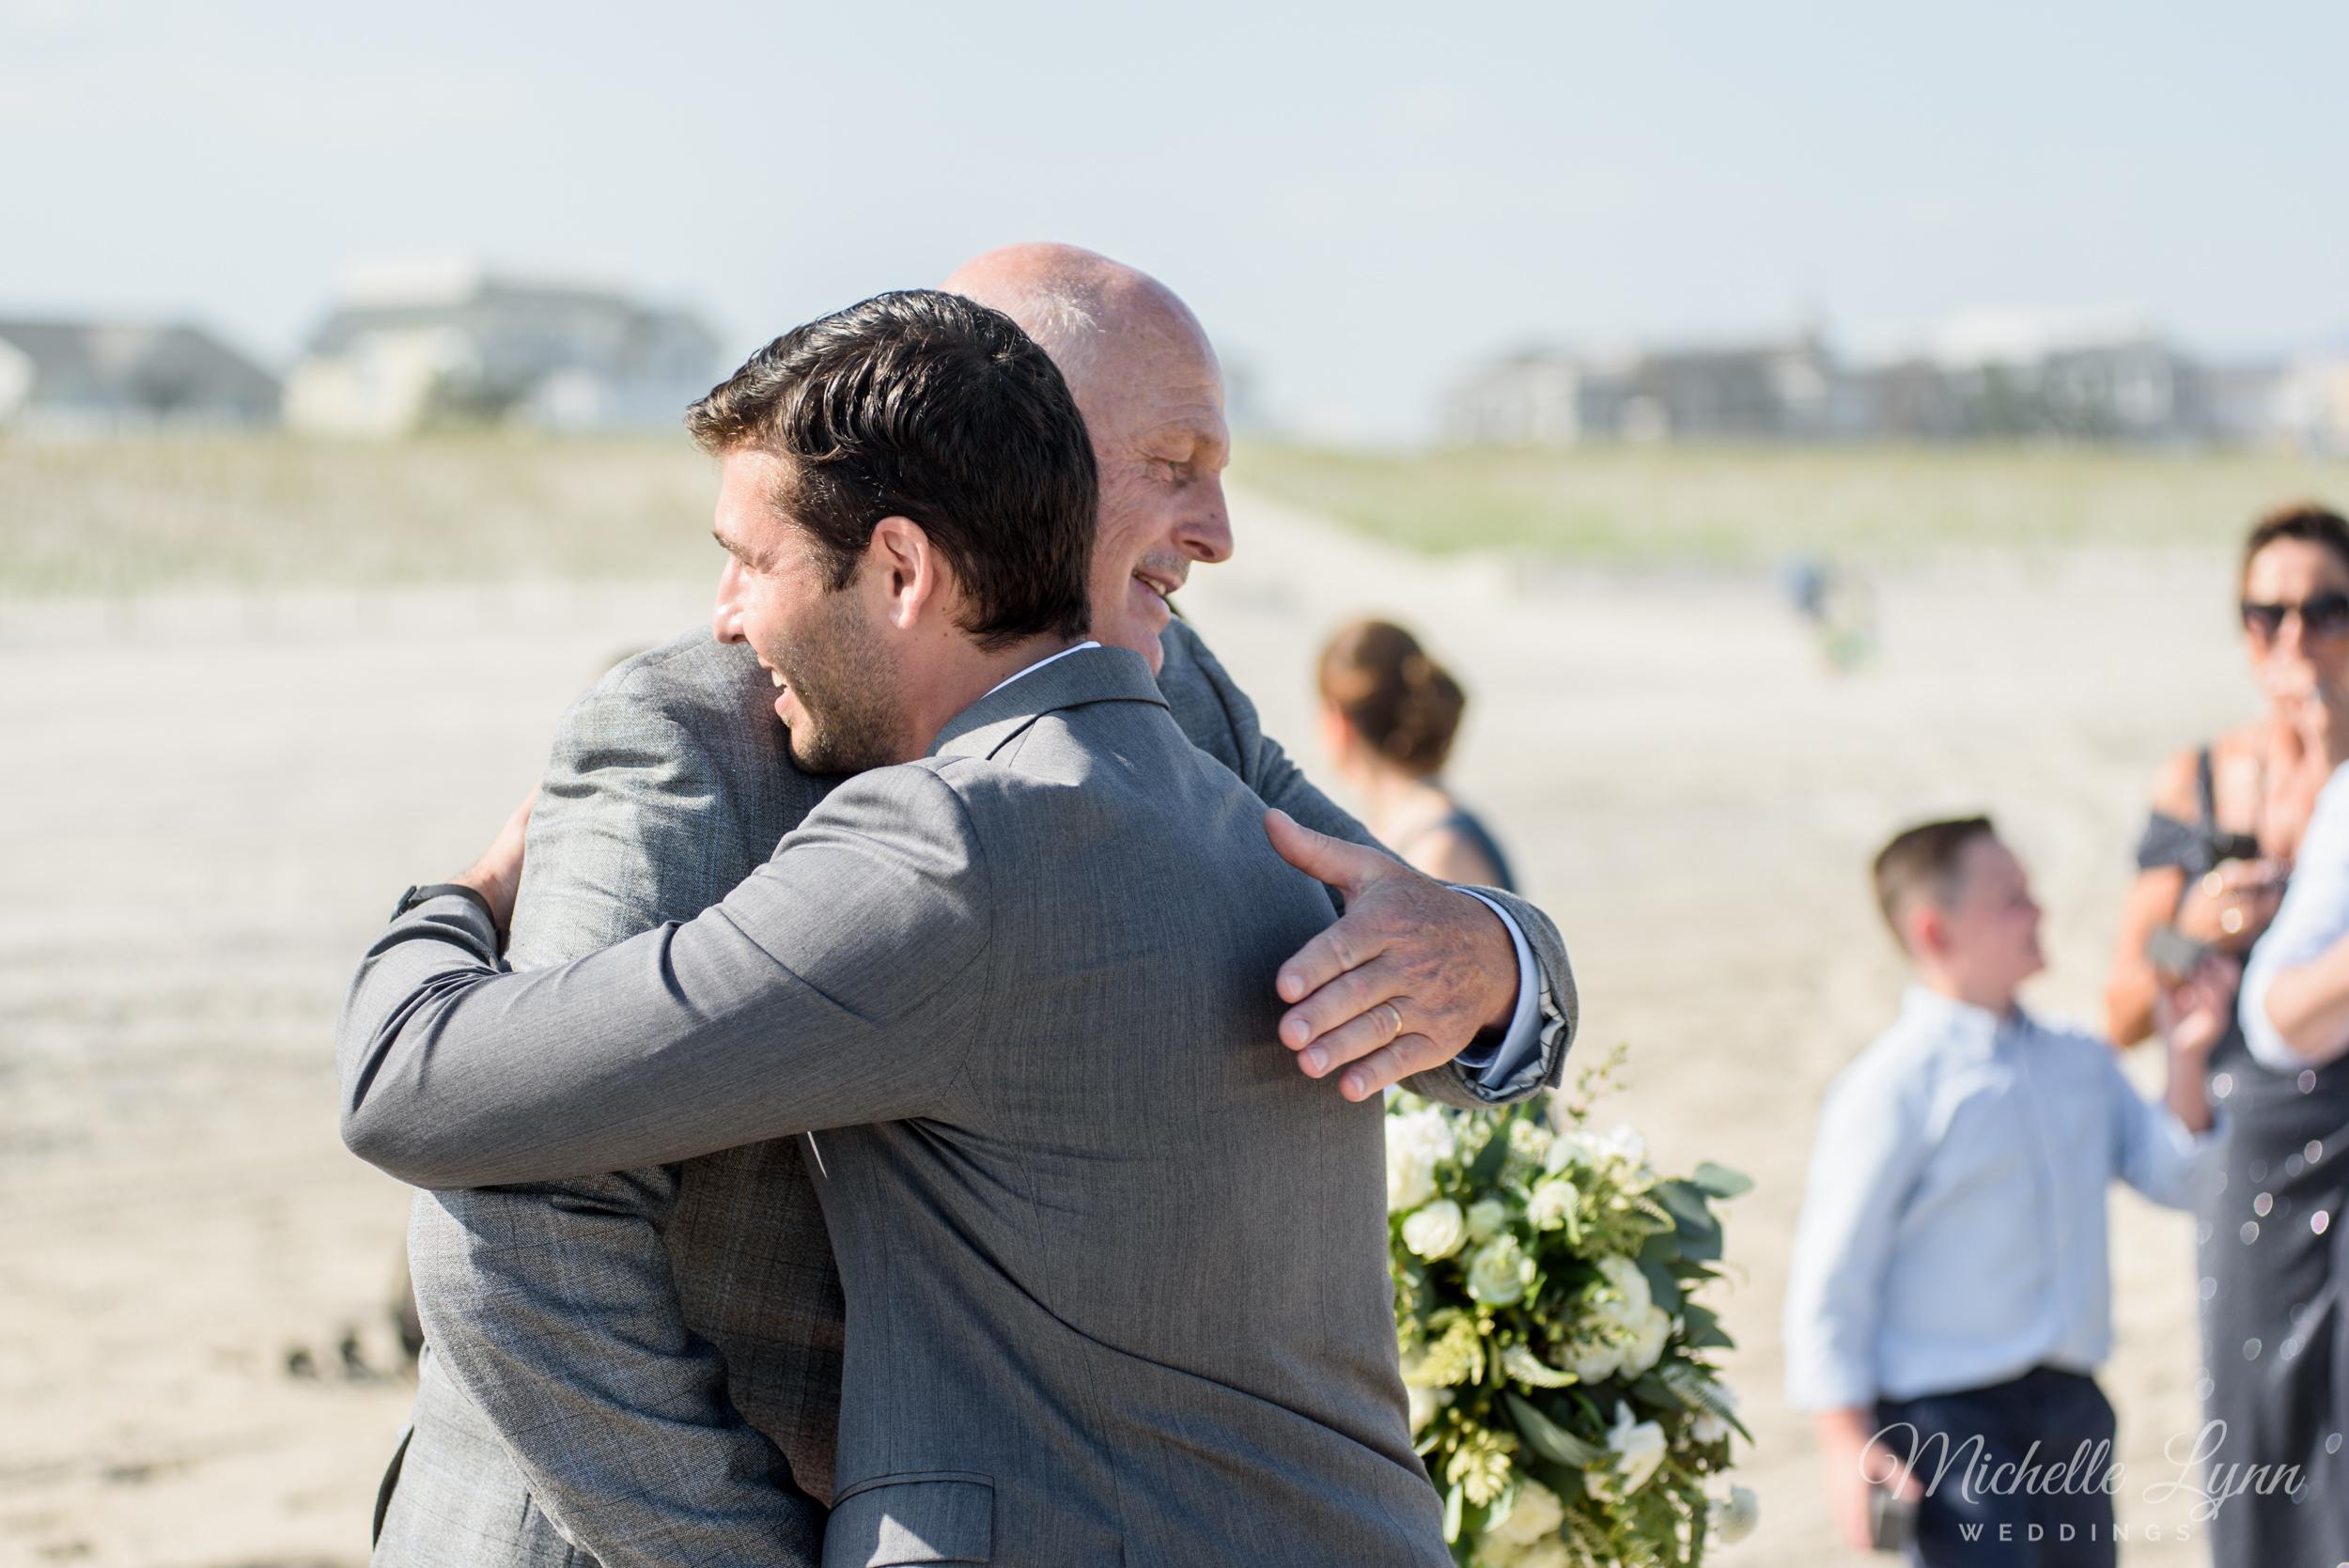 mlw-brant-beach-lbi-wedding-photography-15.jpg